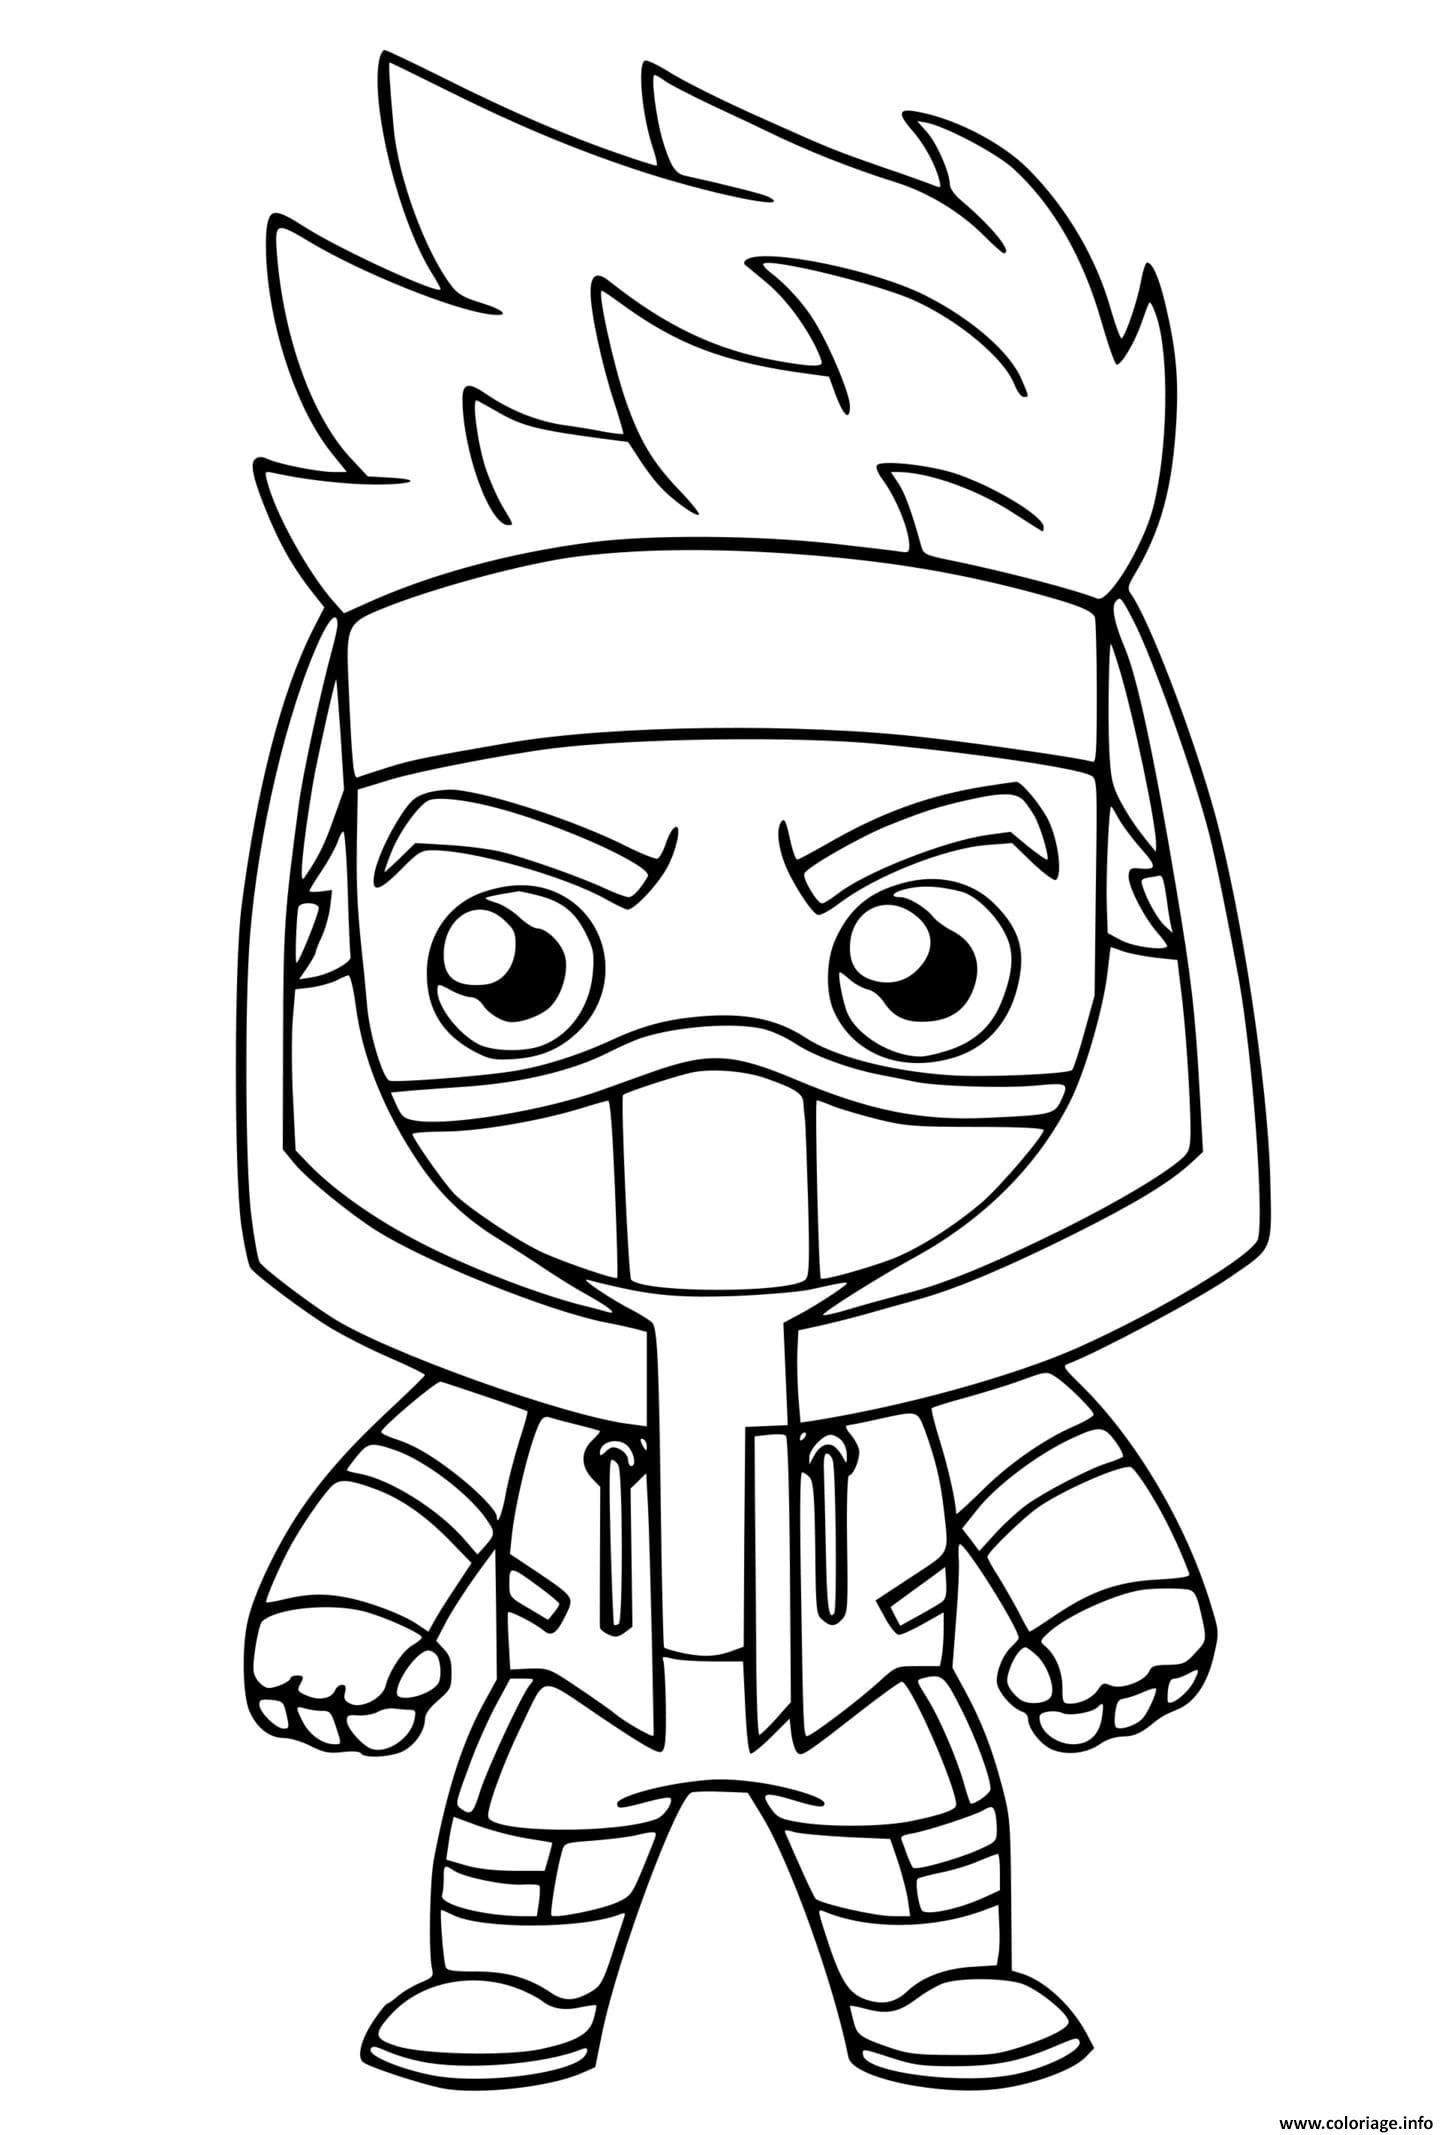 Dessin Ninja Fortnite Coloriage Gratuit à Imprimer